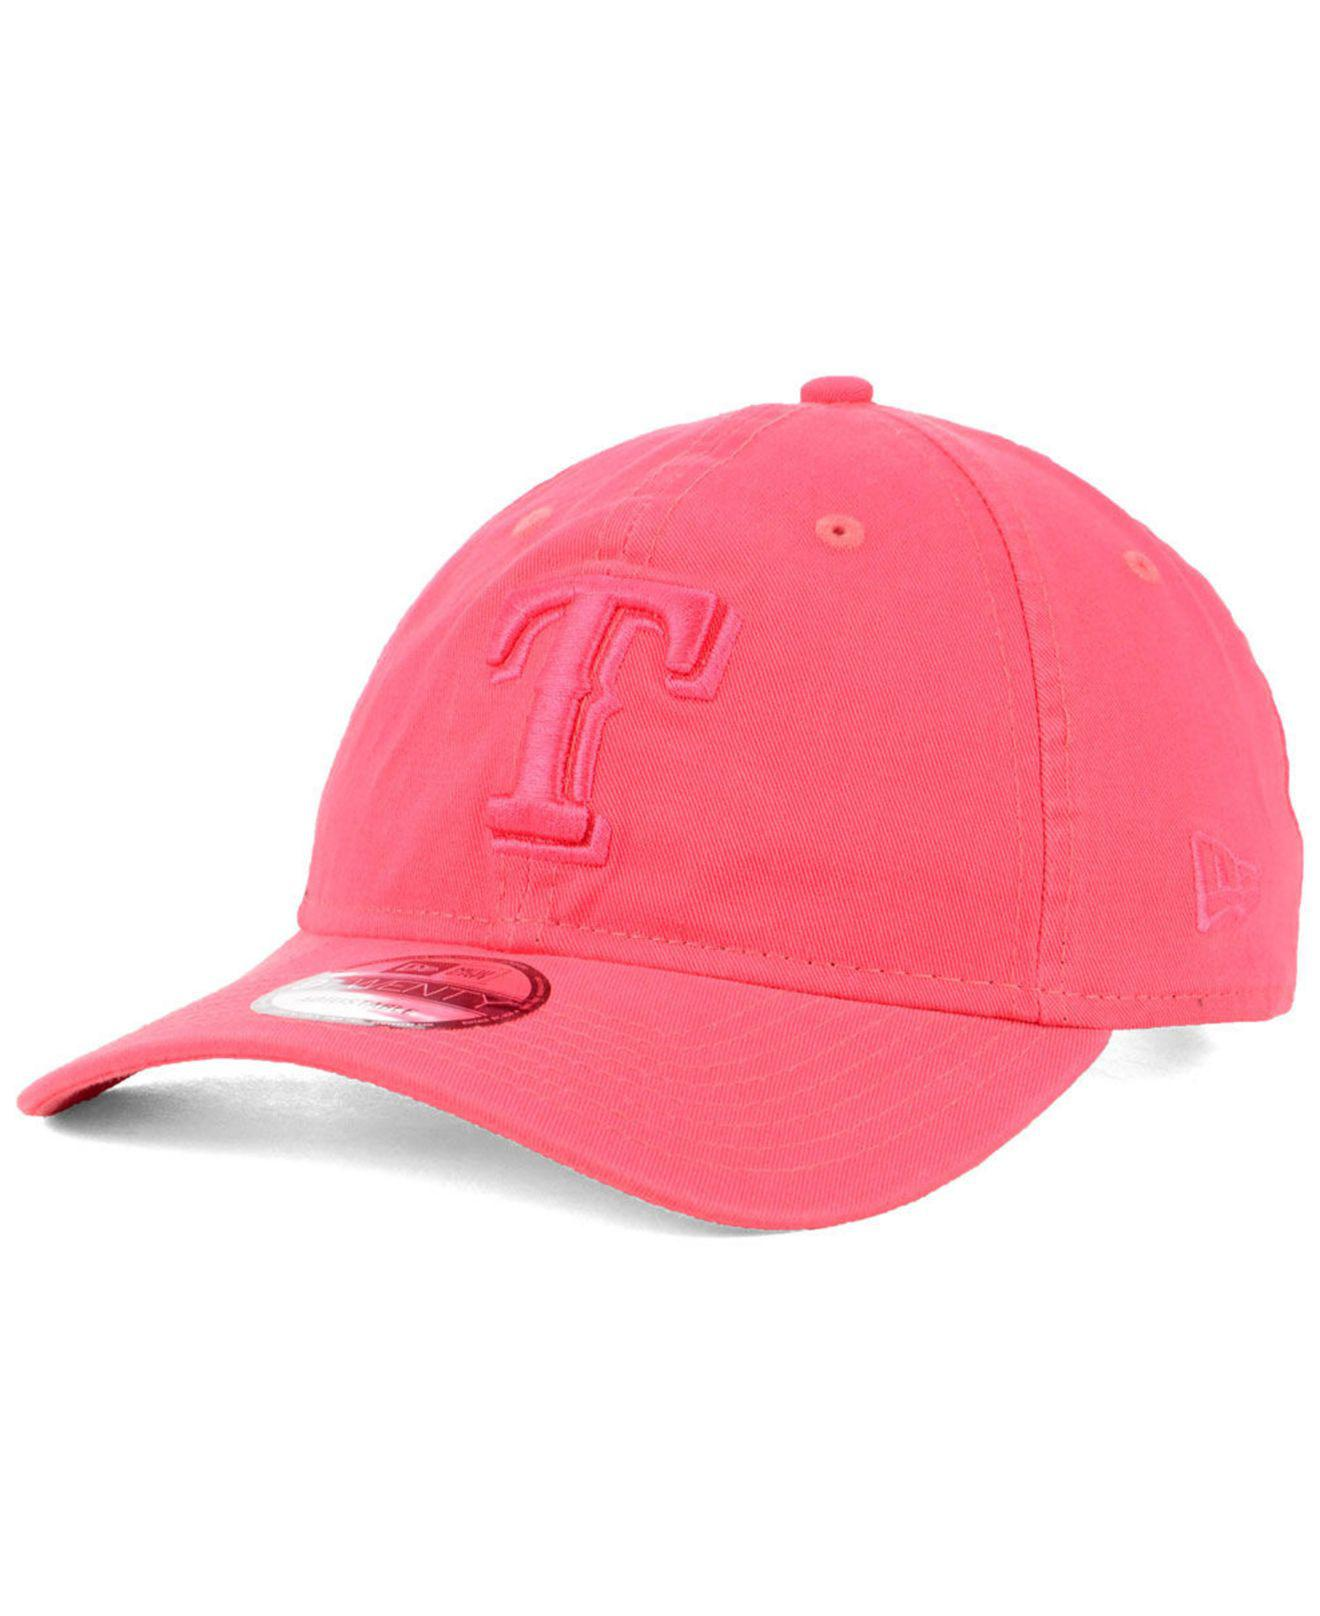 brand new bd1de 7c0f5 ... discount code for ktz. womens pink texas rangers spring classic 9twenty  cap d4991 ba116